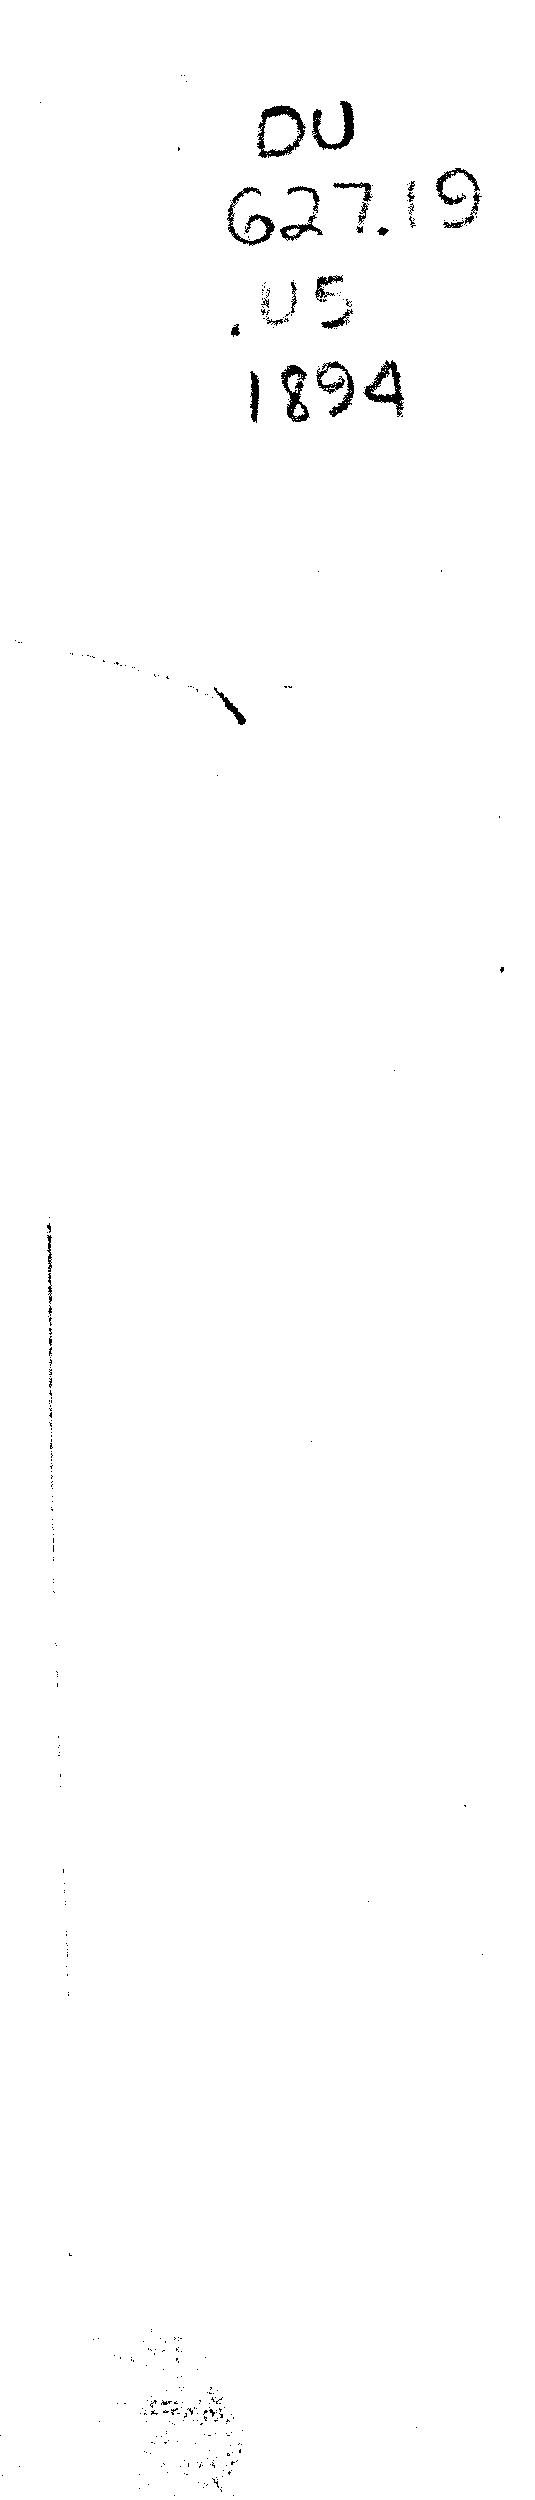 [merged small][merged small][merged small][merged small][merged small][merged small][merged small][ocr errors][merged small][merged small][merged small][ocr errors][merged small][ocr errors][ocr errors]